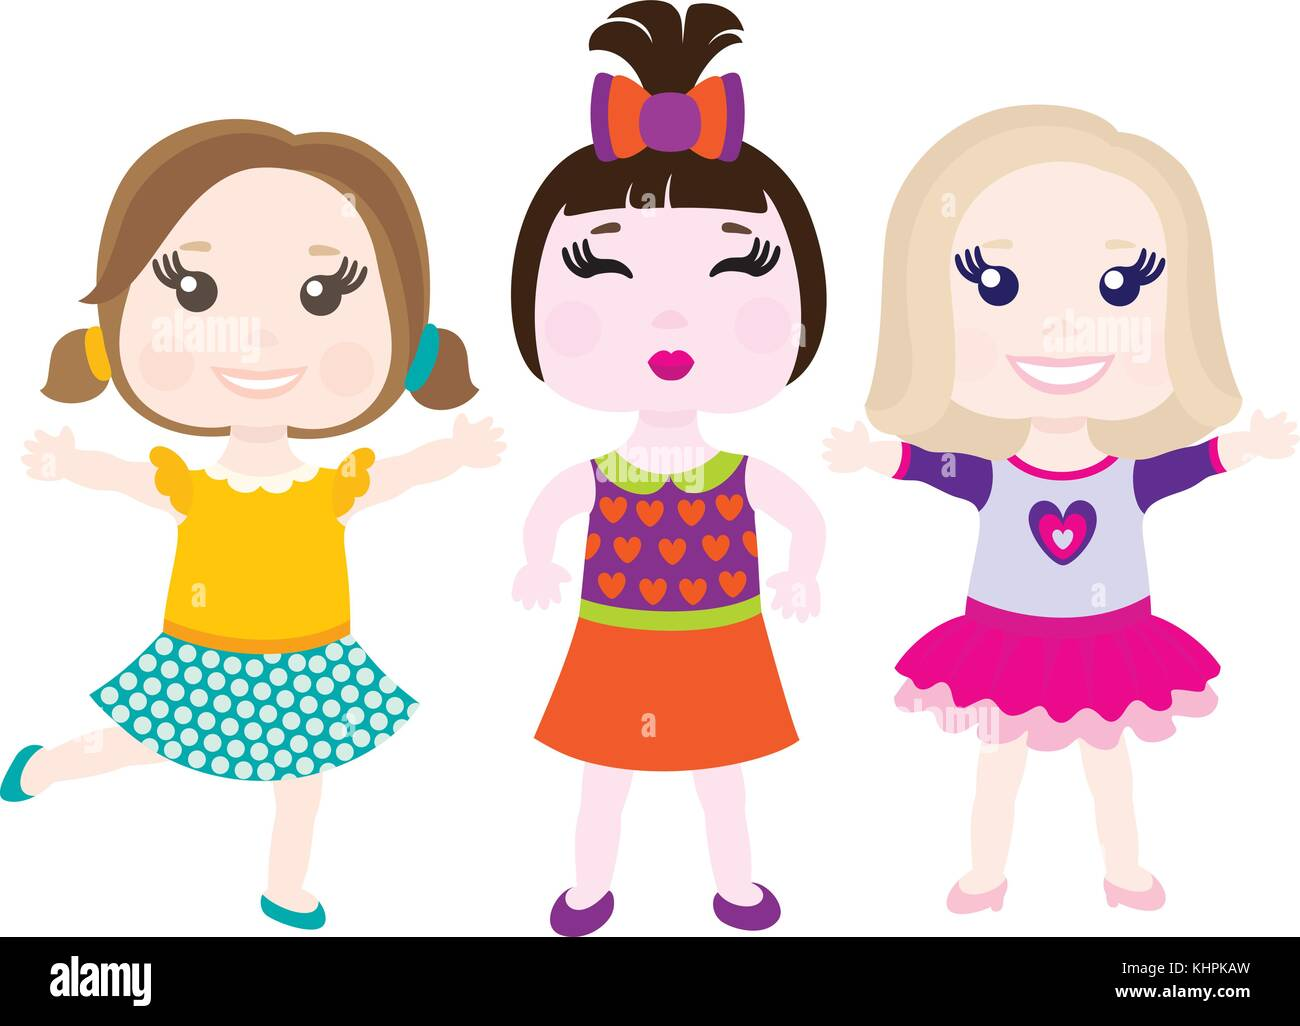 Vector illustration of three little smiling girls - Stock Image